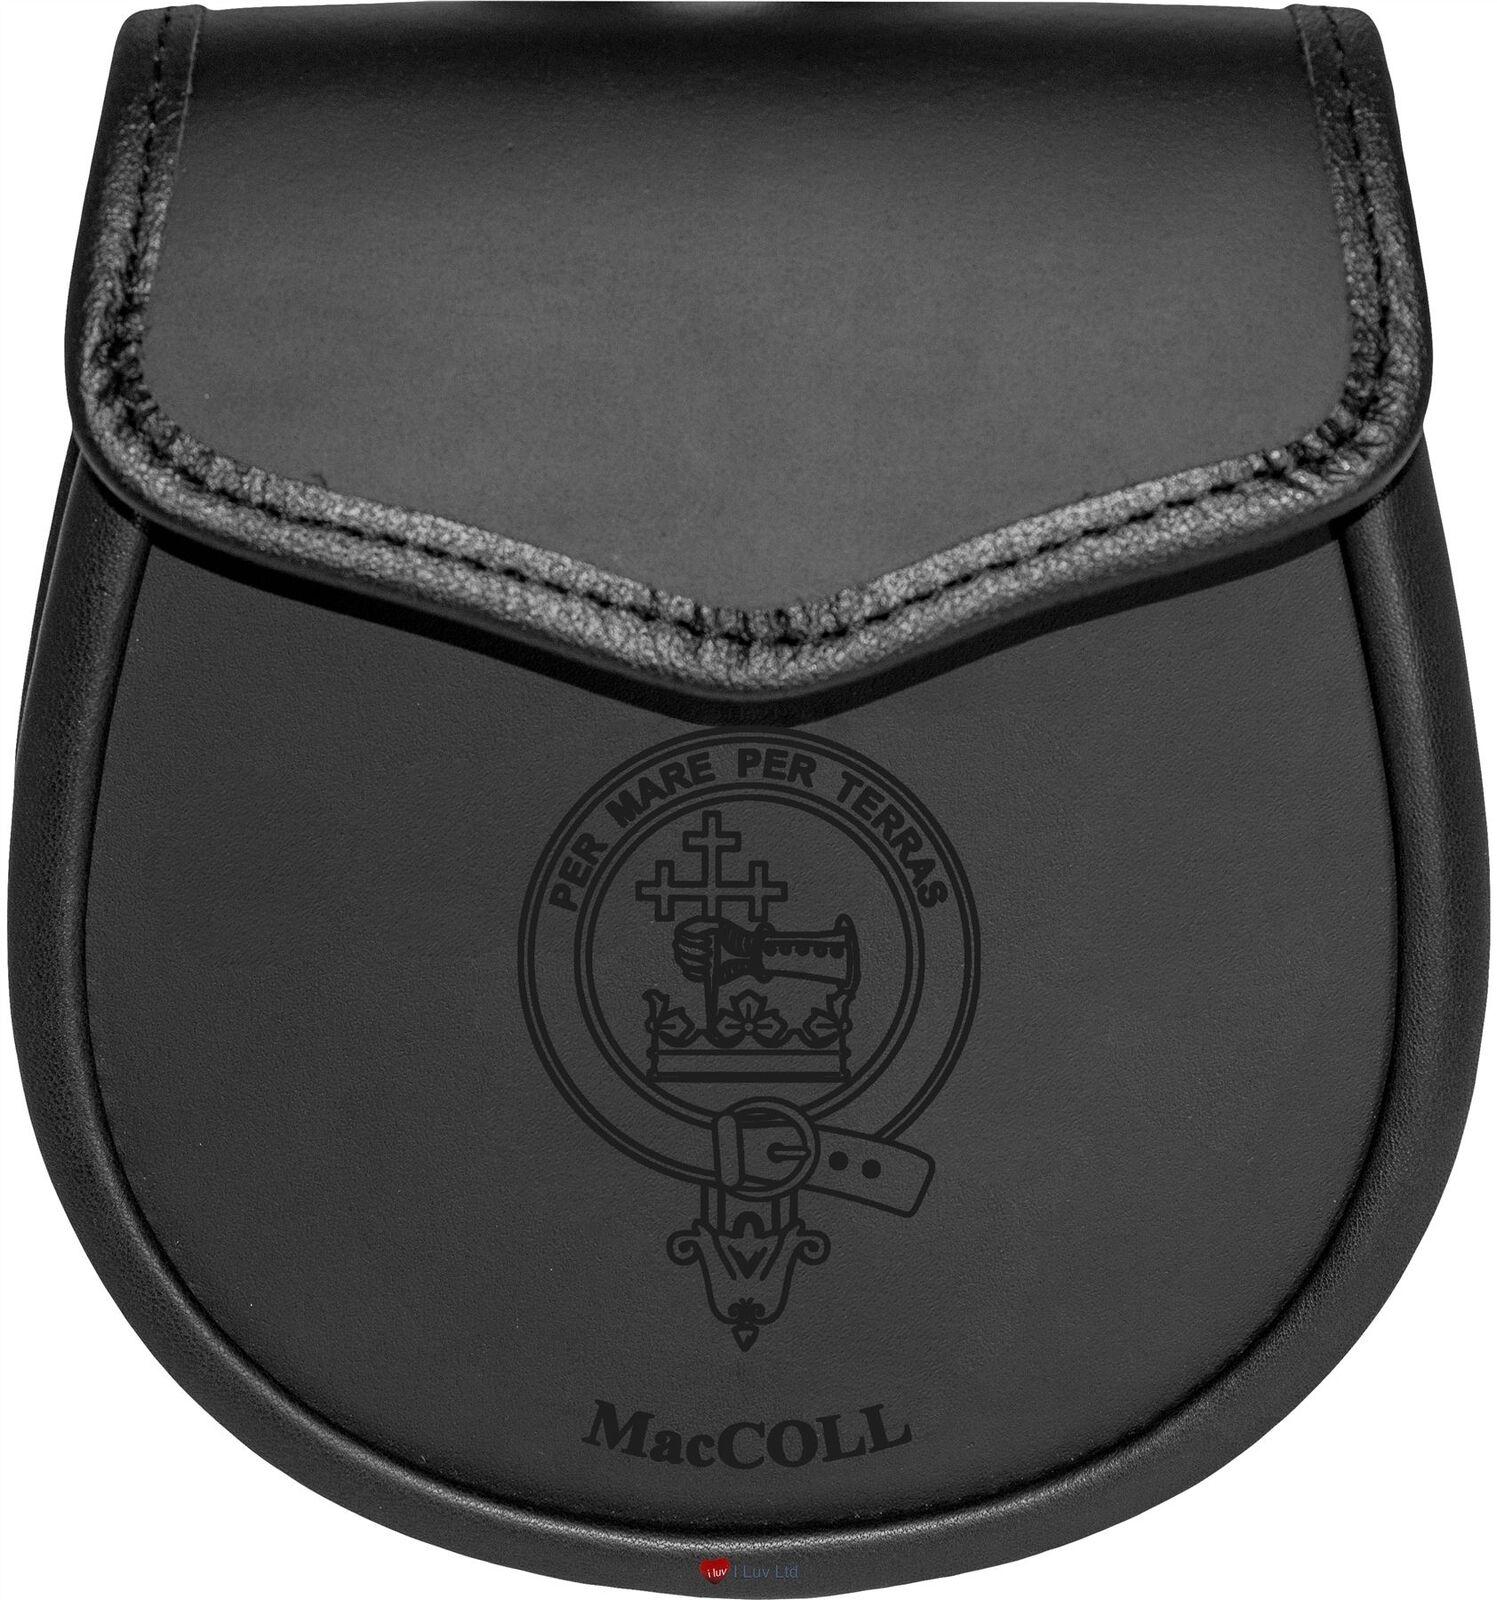 MacColl Leather Day Sporran Scottish Clan Crest